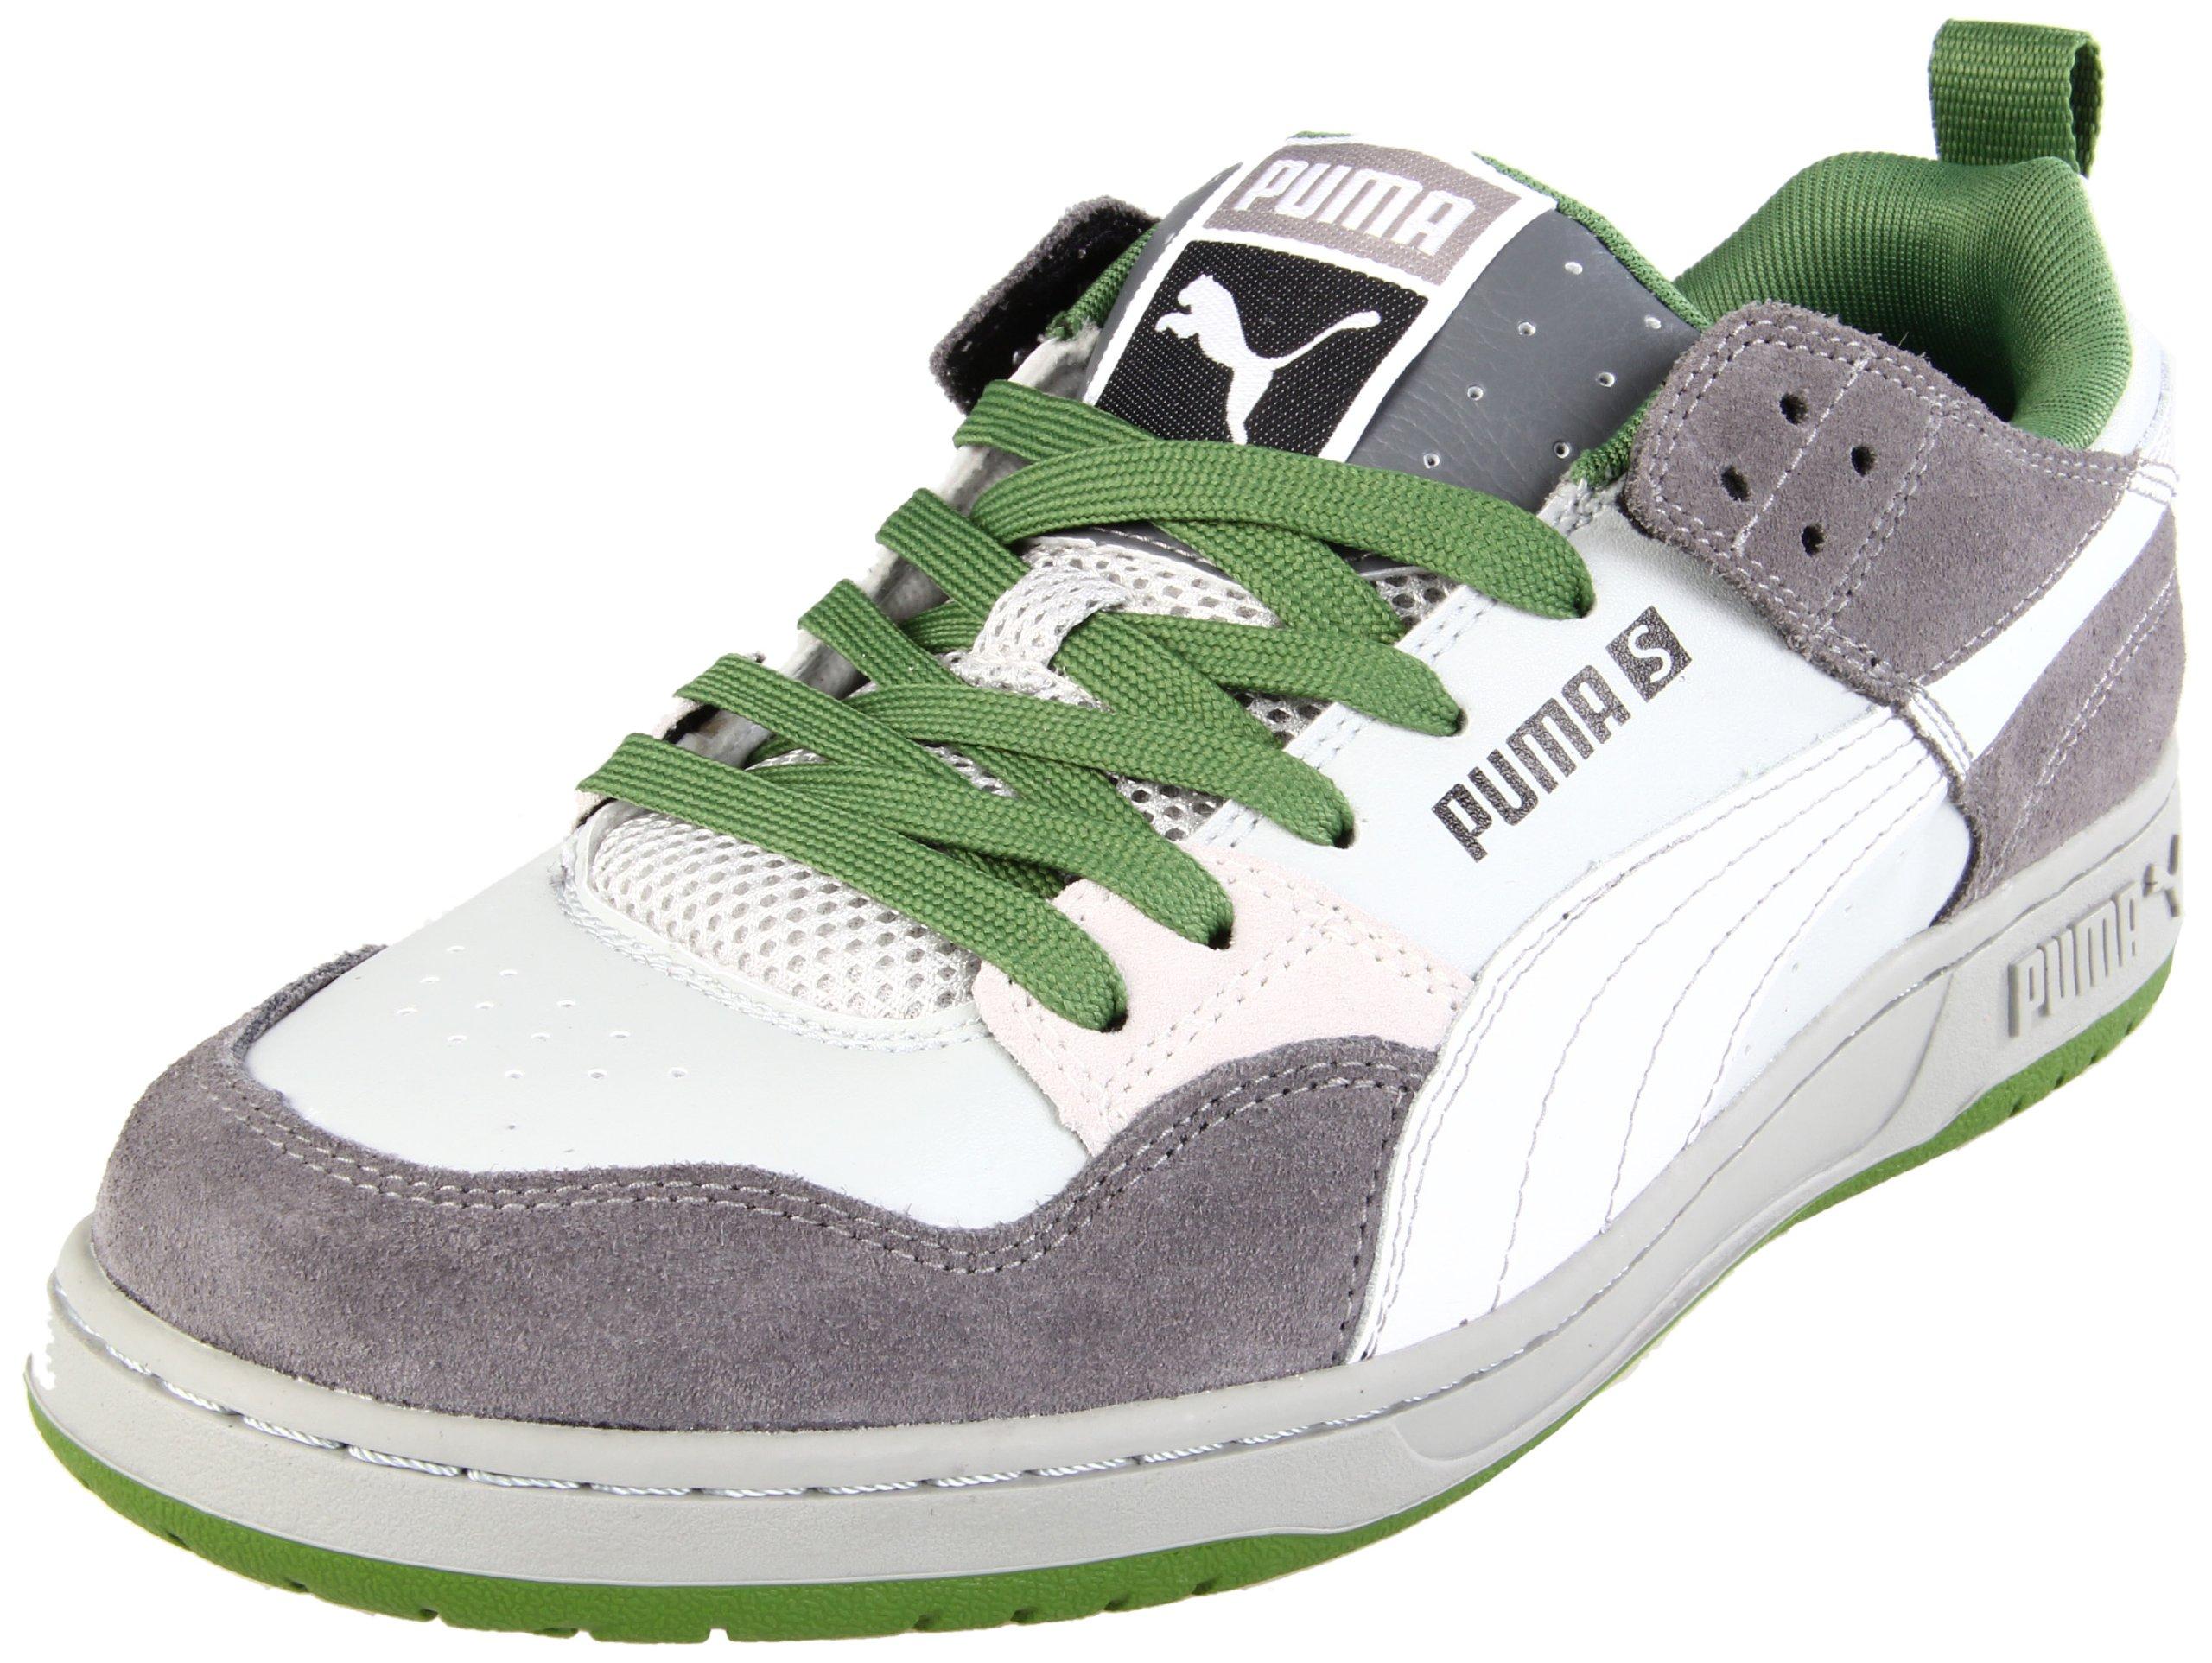 Puma Grifter S Fashion Sneaker,Grey Violet/White/Steel Grey,14 D US